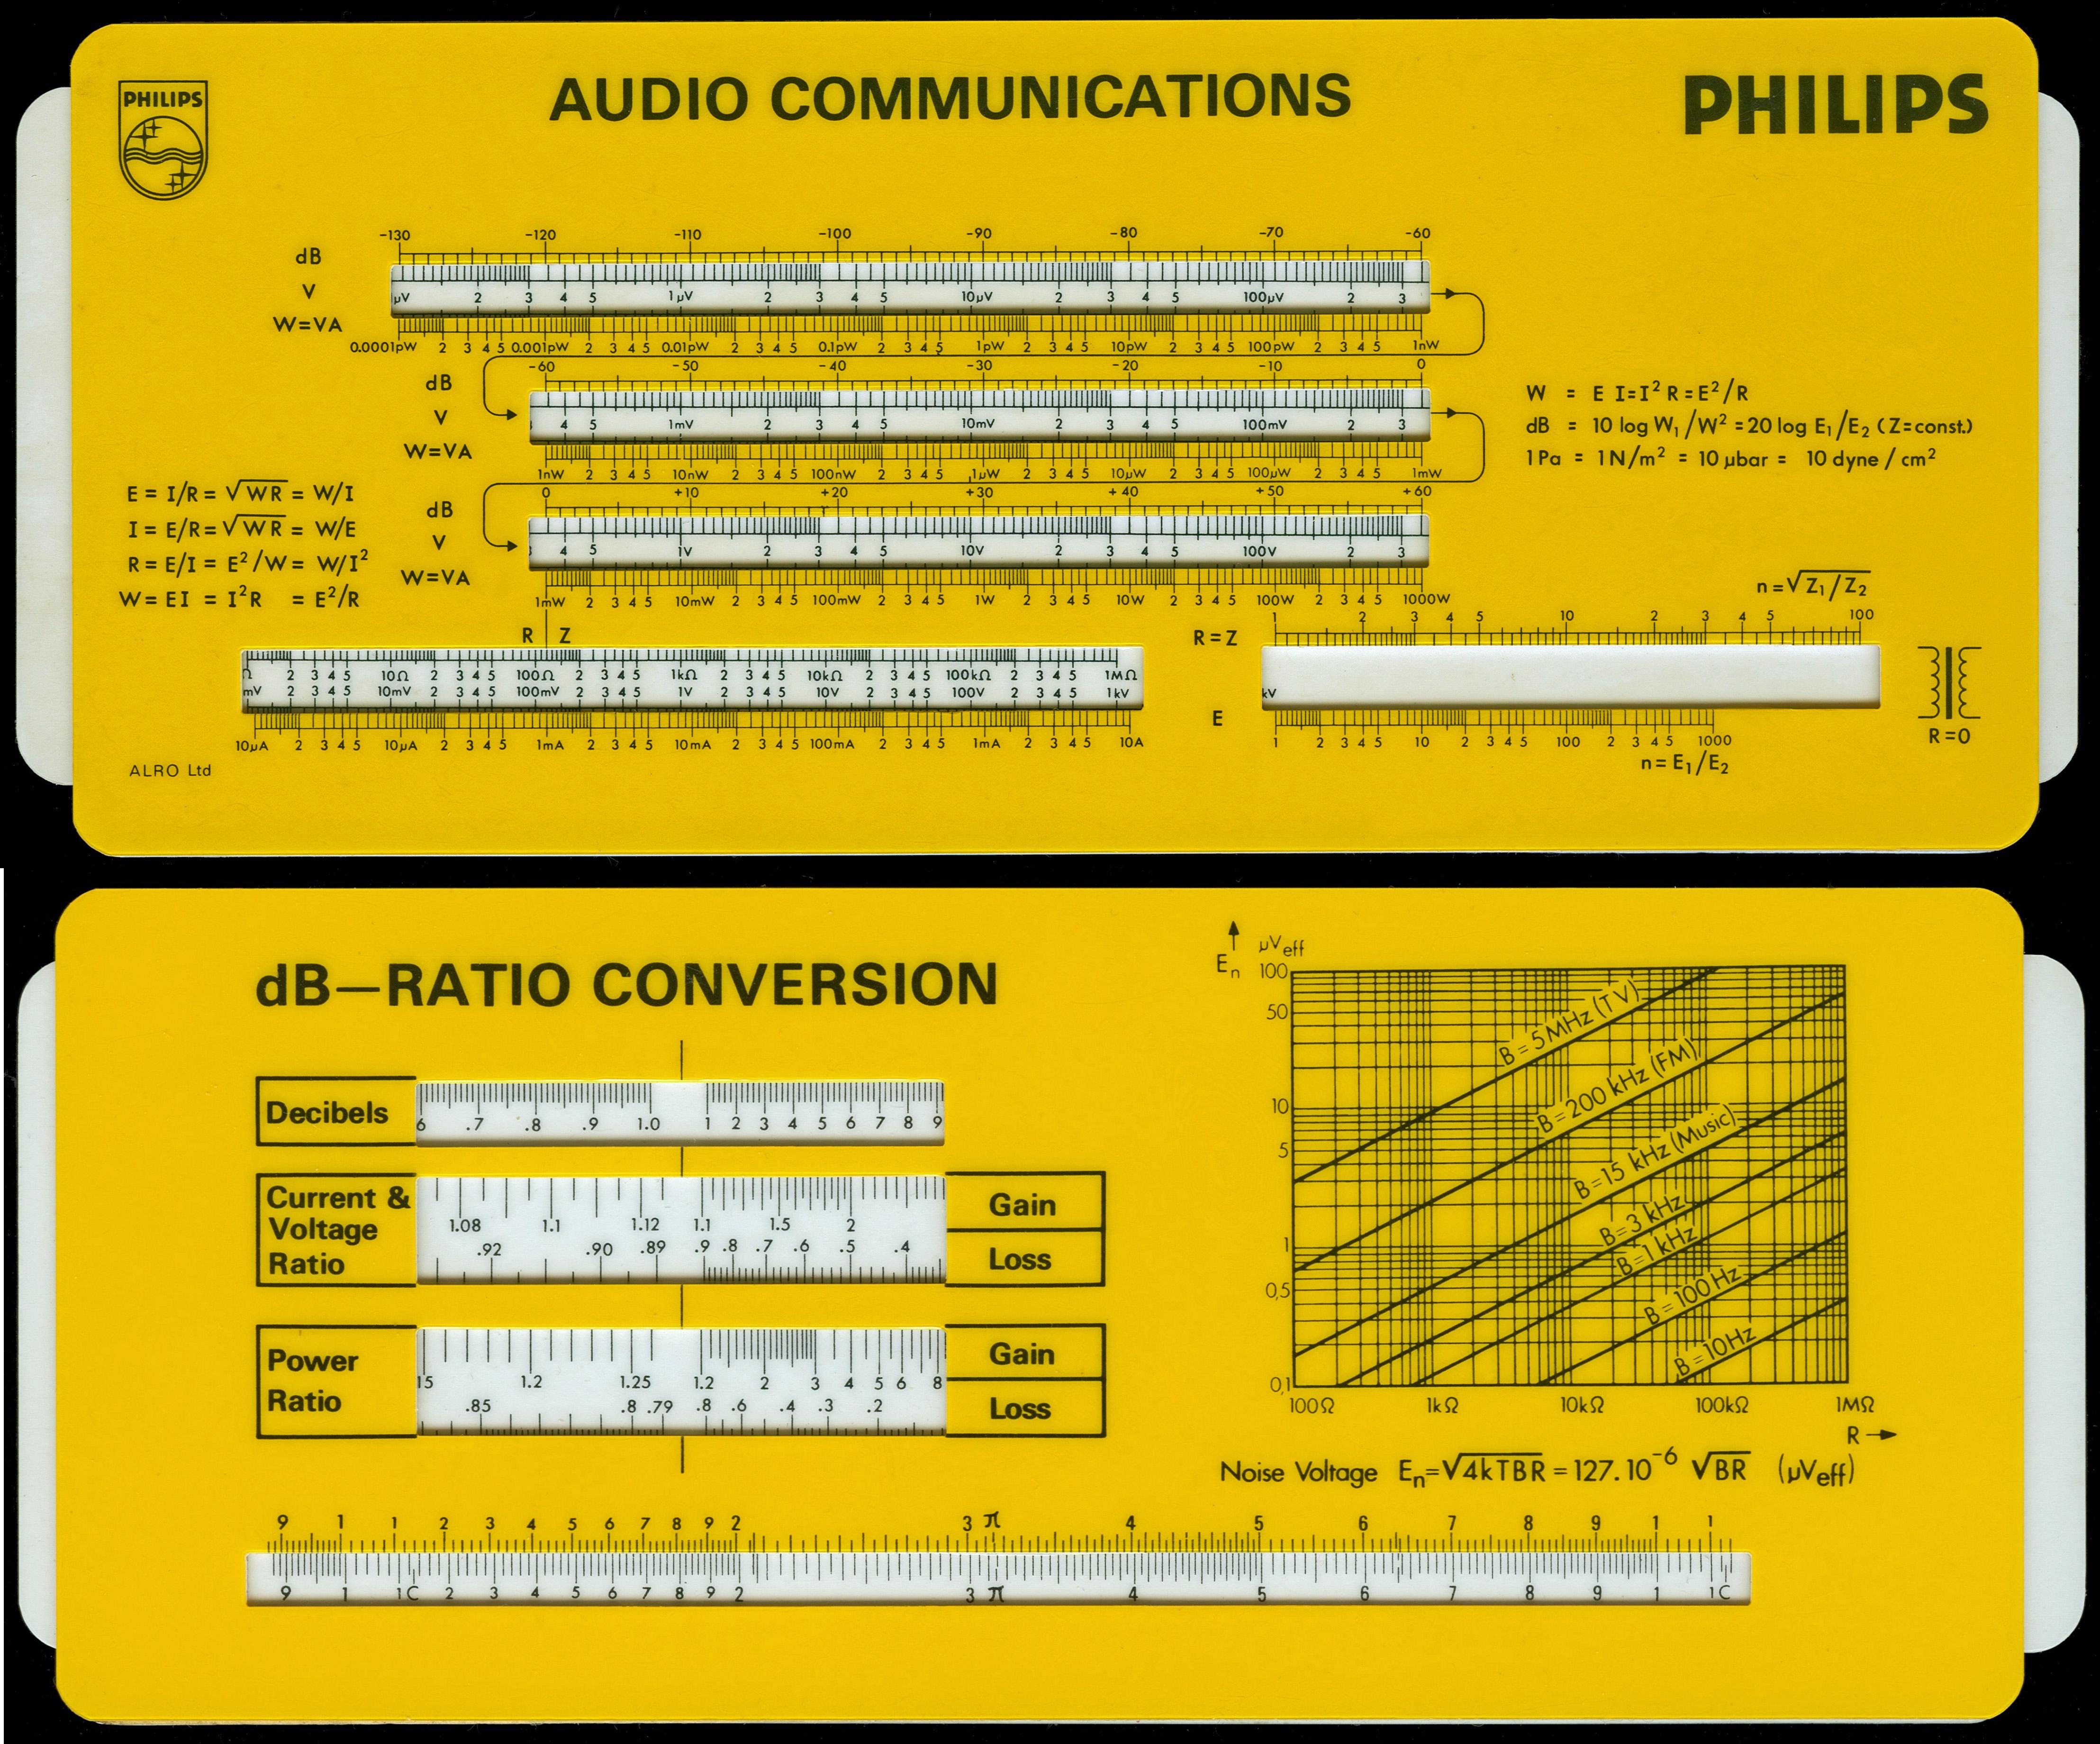 ALRO PHILIPS AUDIO COMMUNICATIIONS (AC-3.02) Electro/Conversion